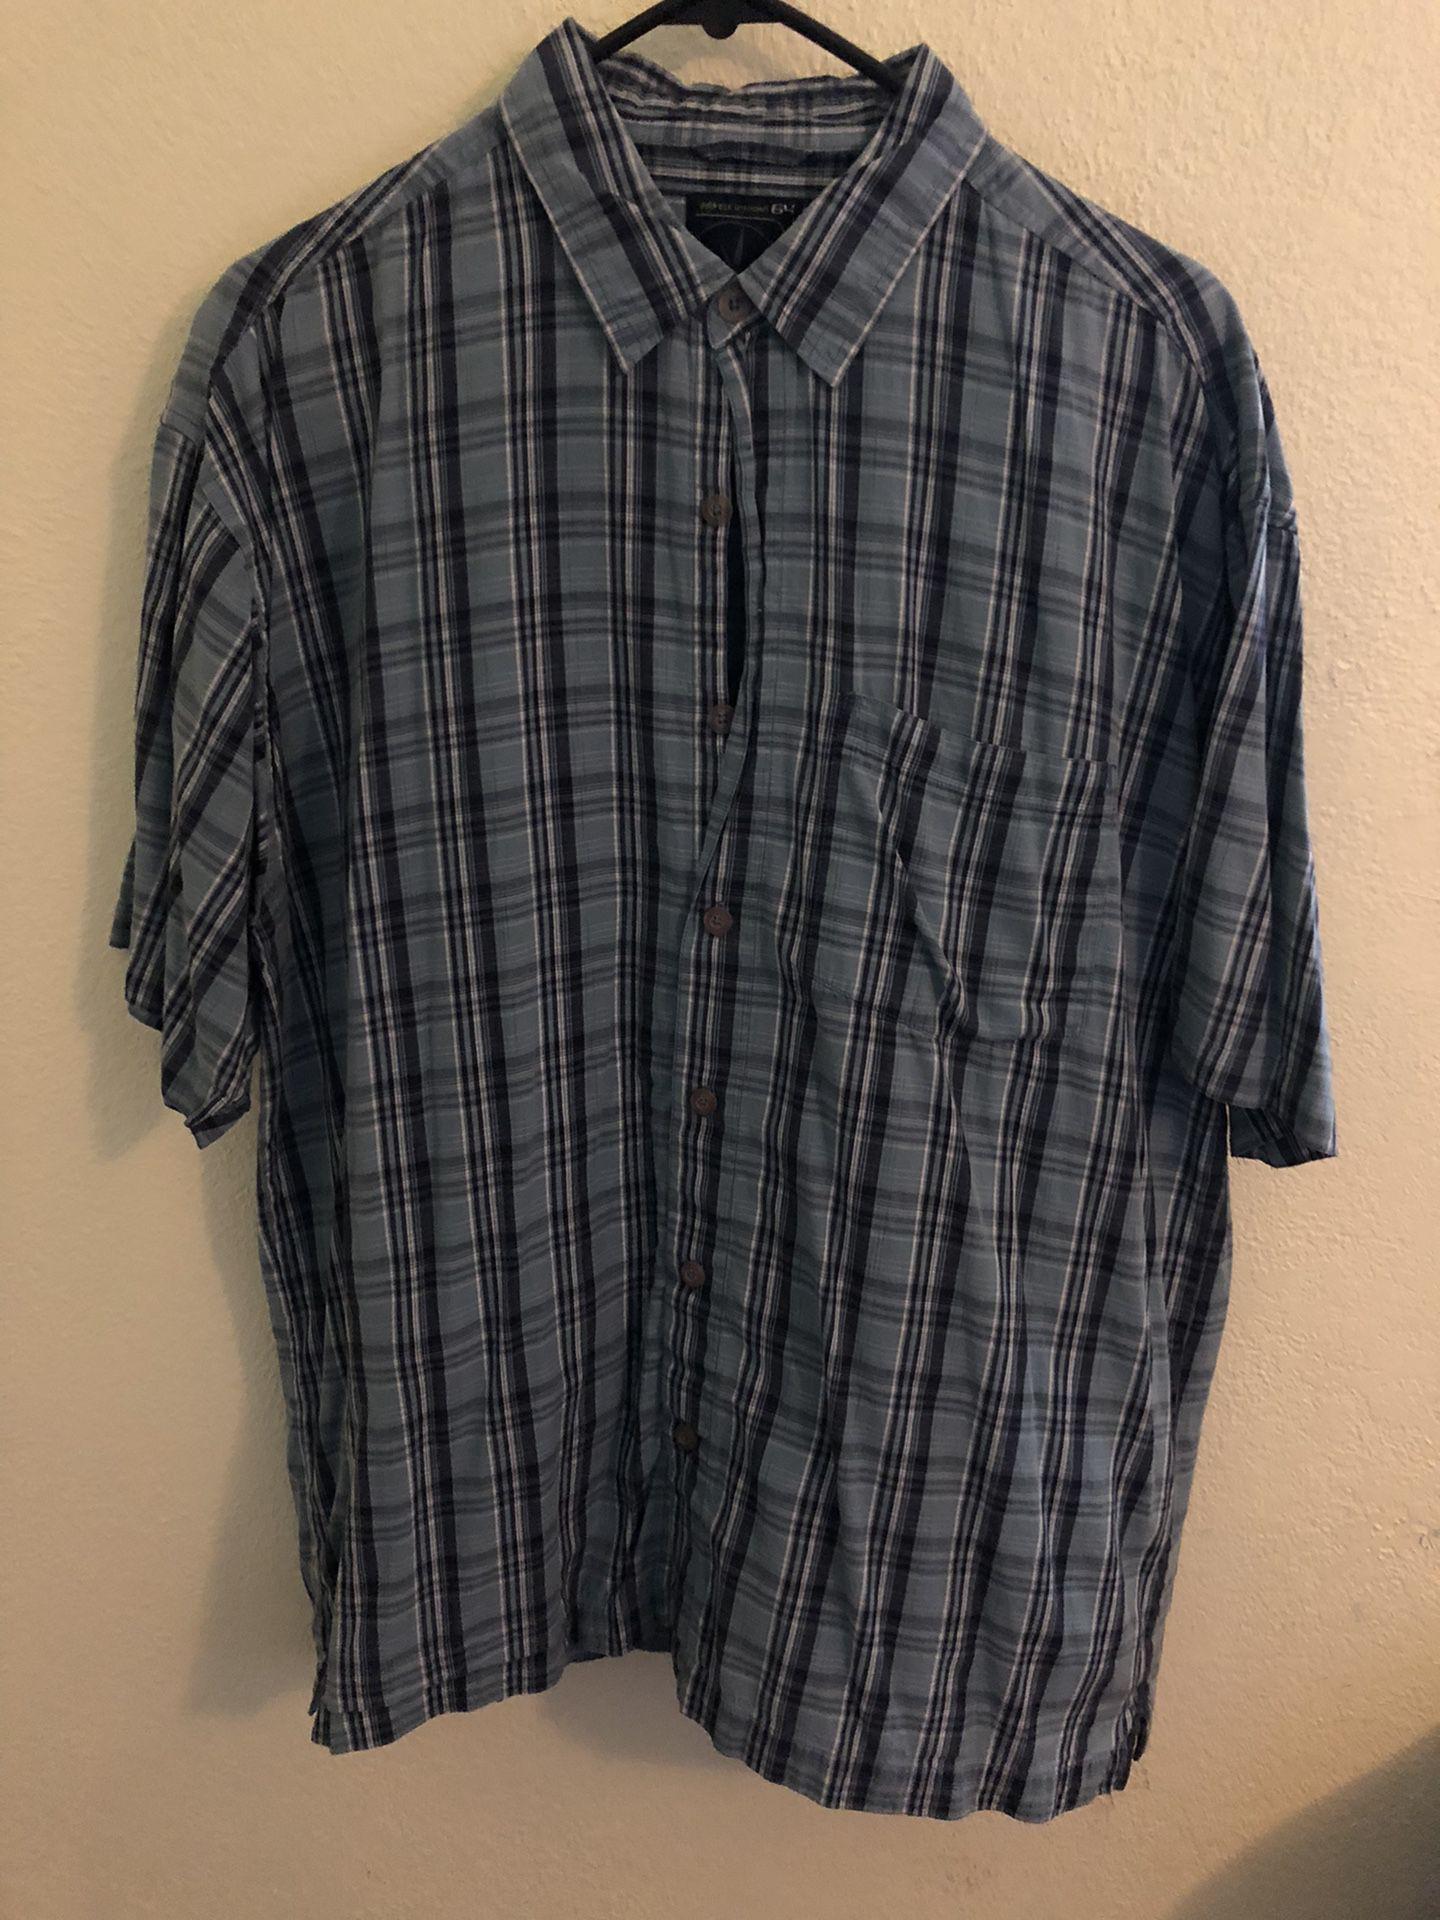 Blue Plaid Button Up T Shirt // Pocket T Shirt // 90's // Y2K // Skateboards // Classic // Work Shirt // Dress Shirt // Slacks // Tucked In // Sunday